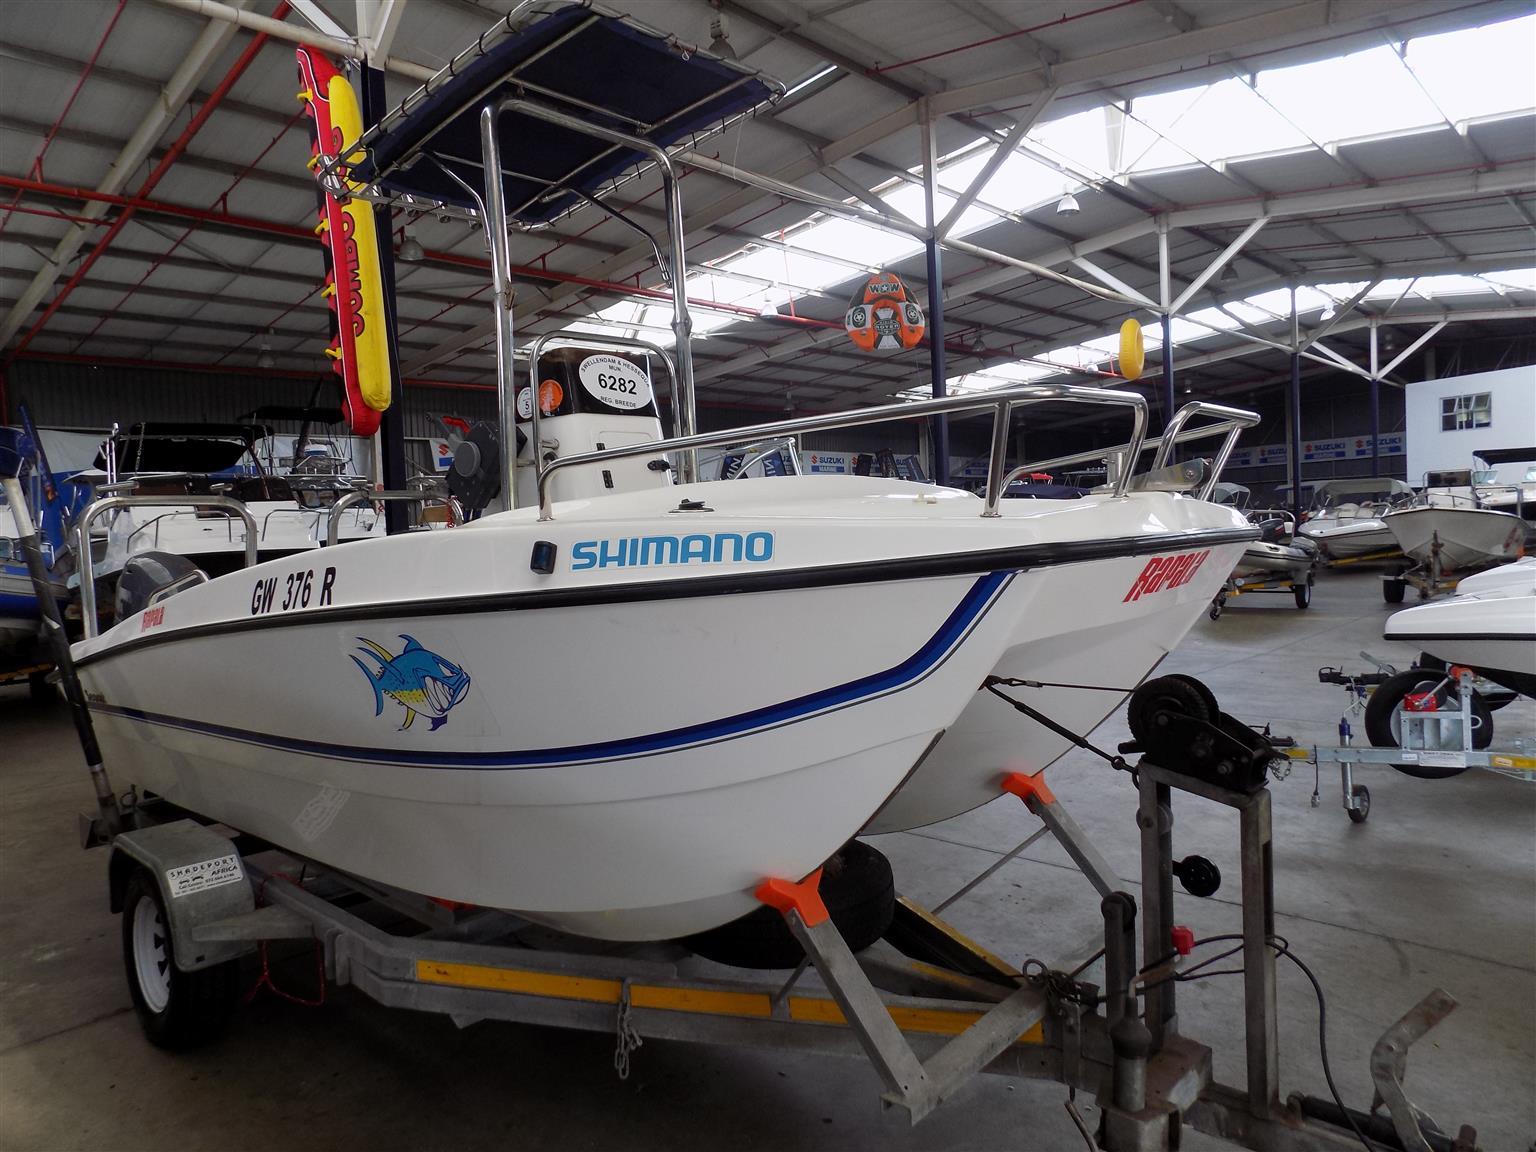 seacat 465 on trailer 2 x 40 hp yamaha 4 strokes